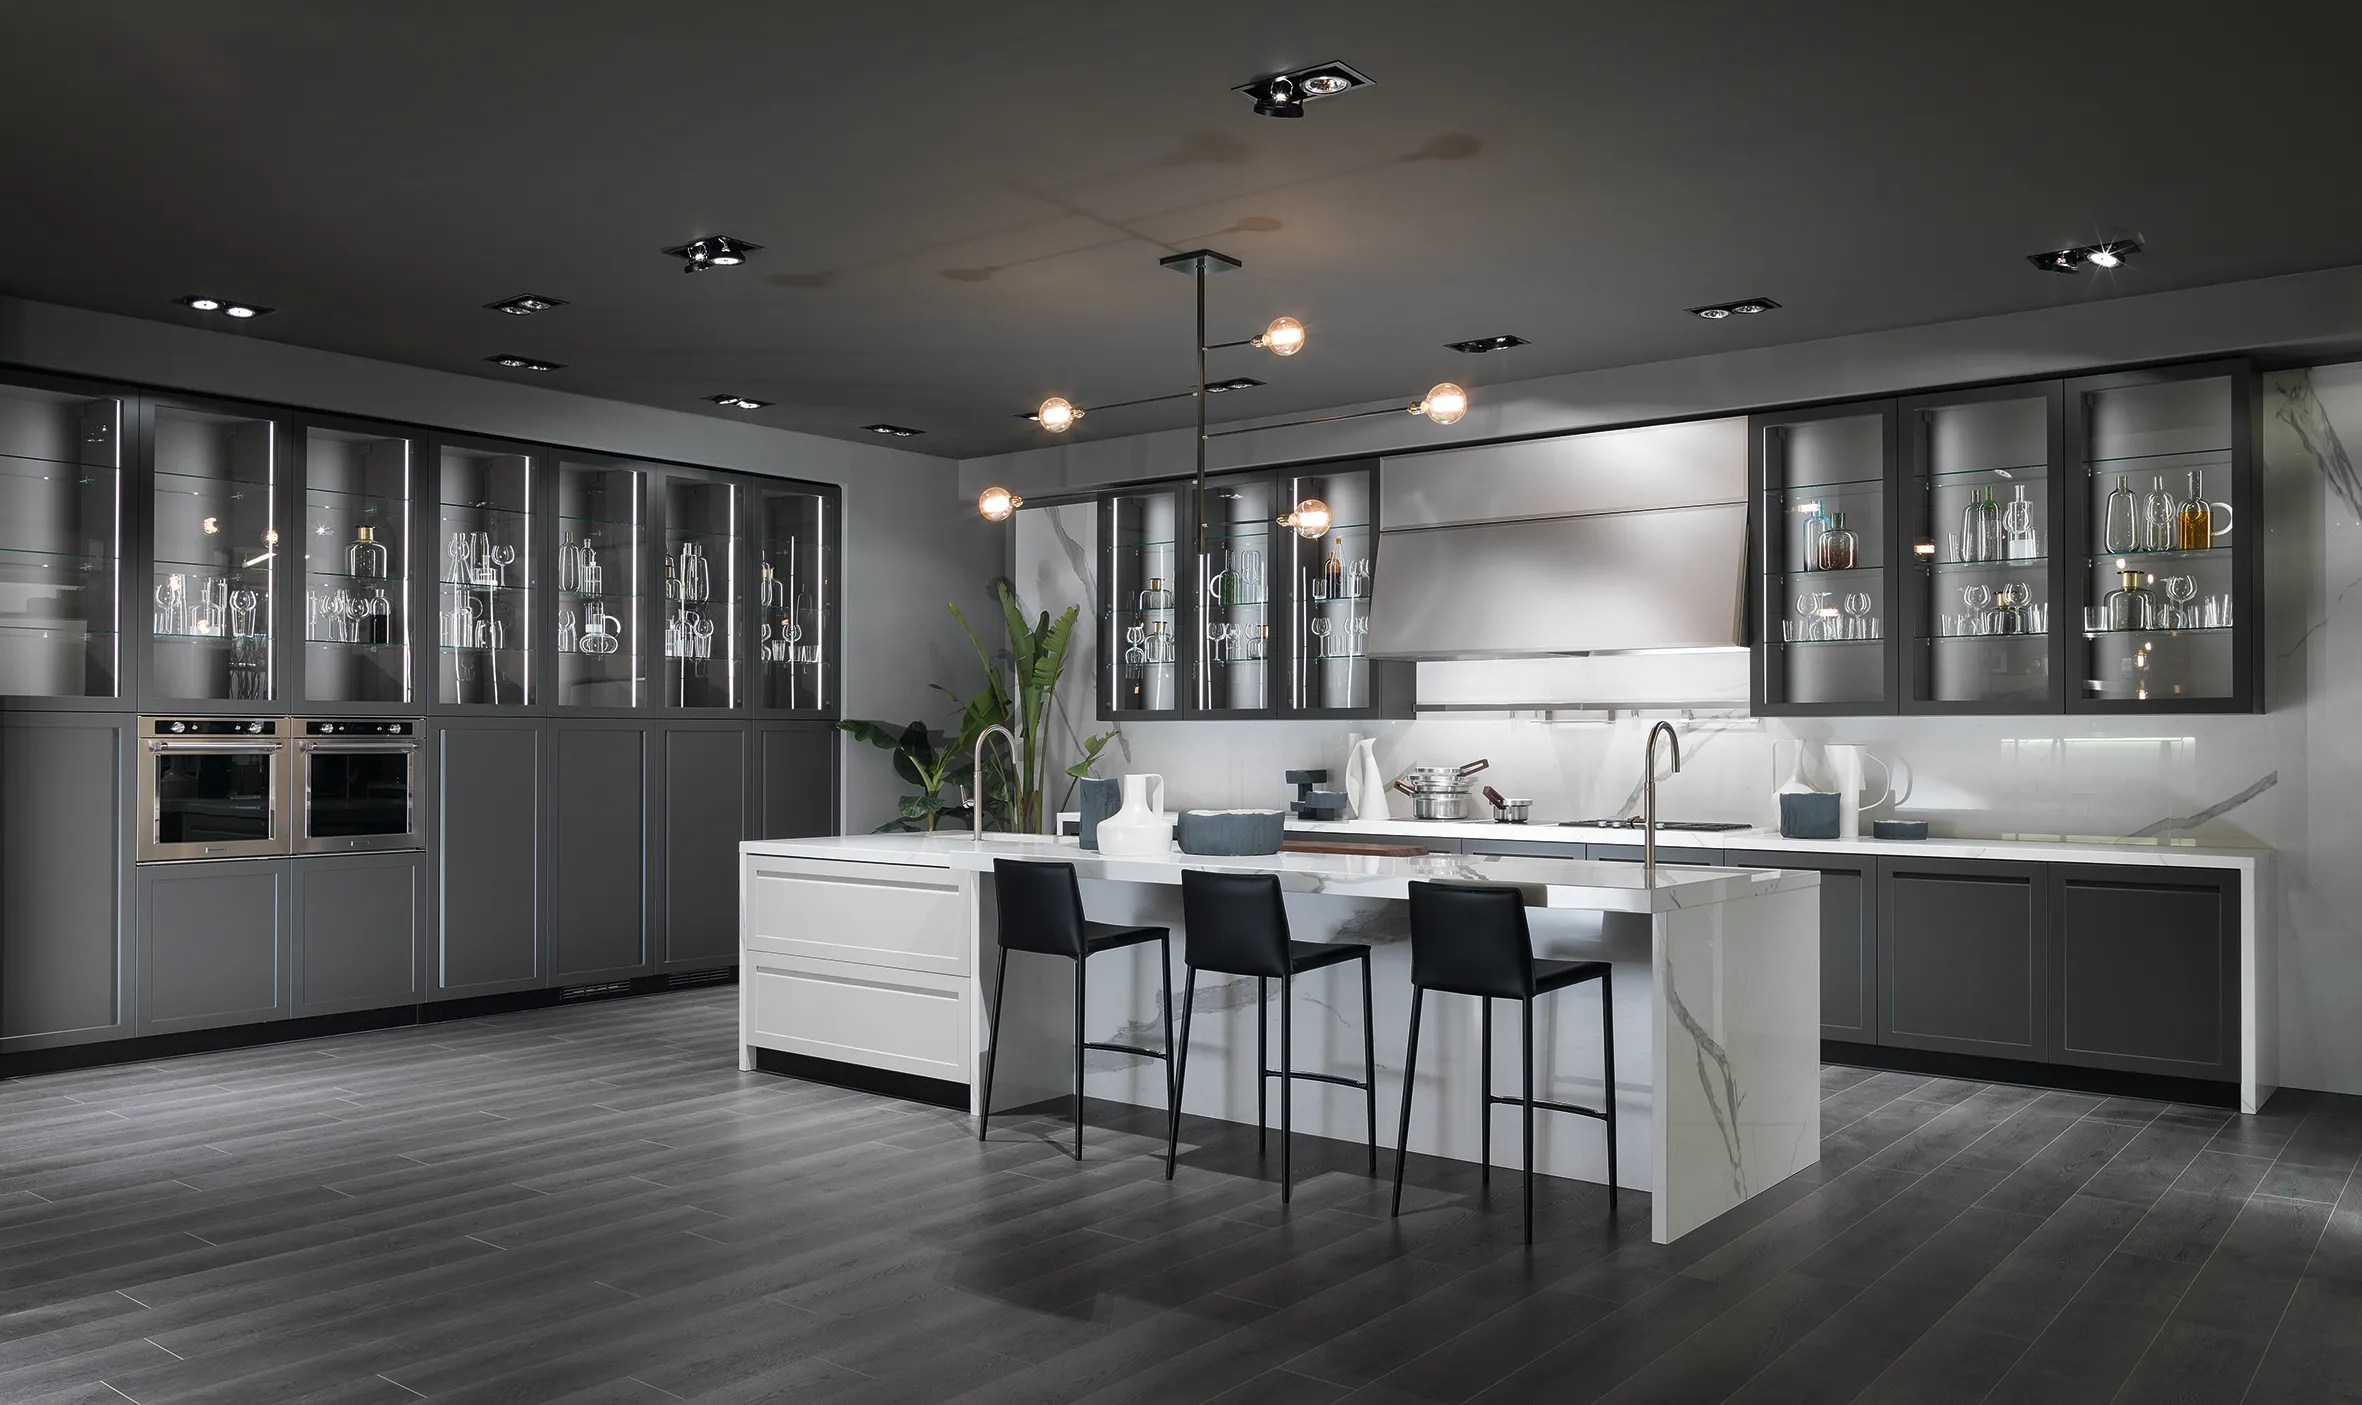 Fullsize Of Kitchens Ideas Photos